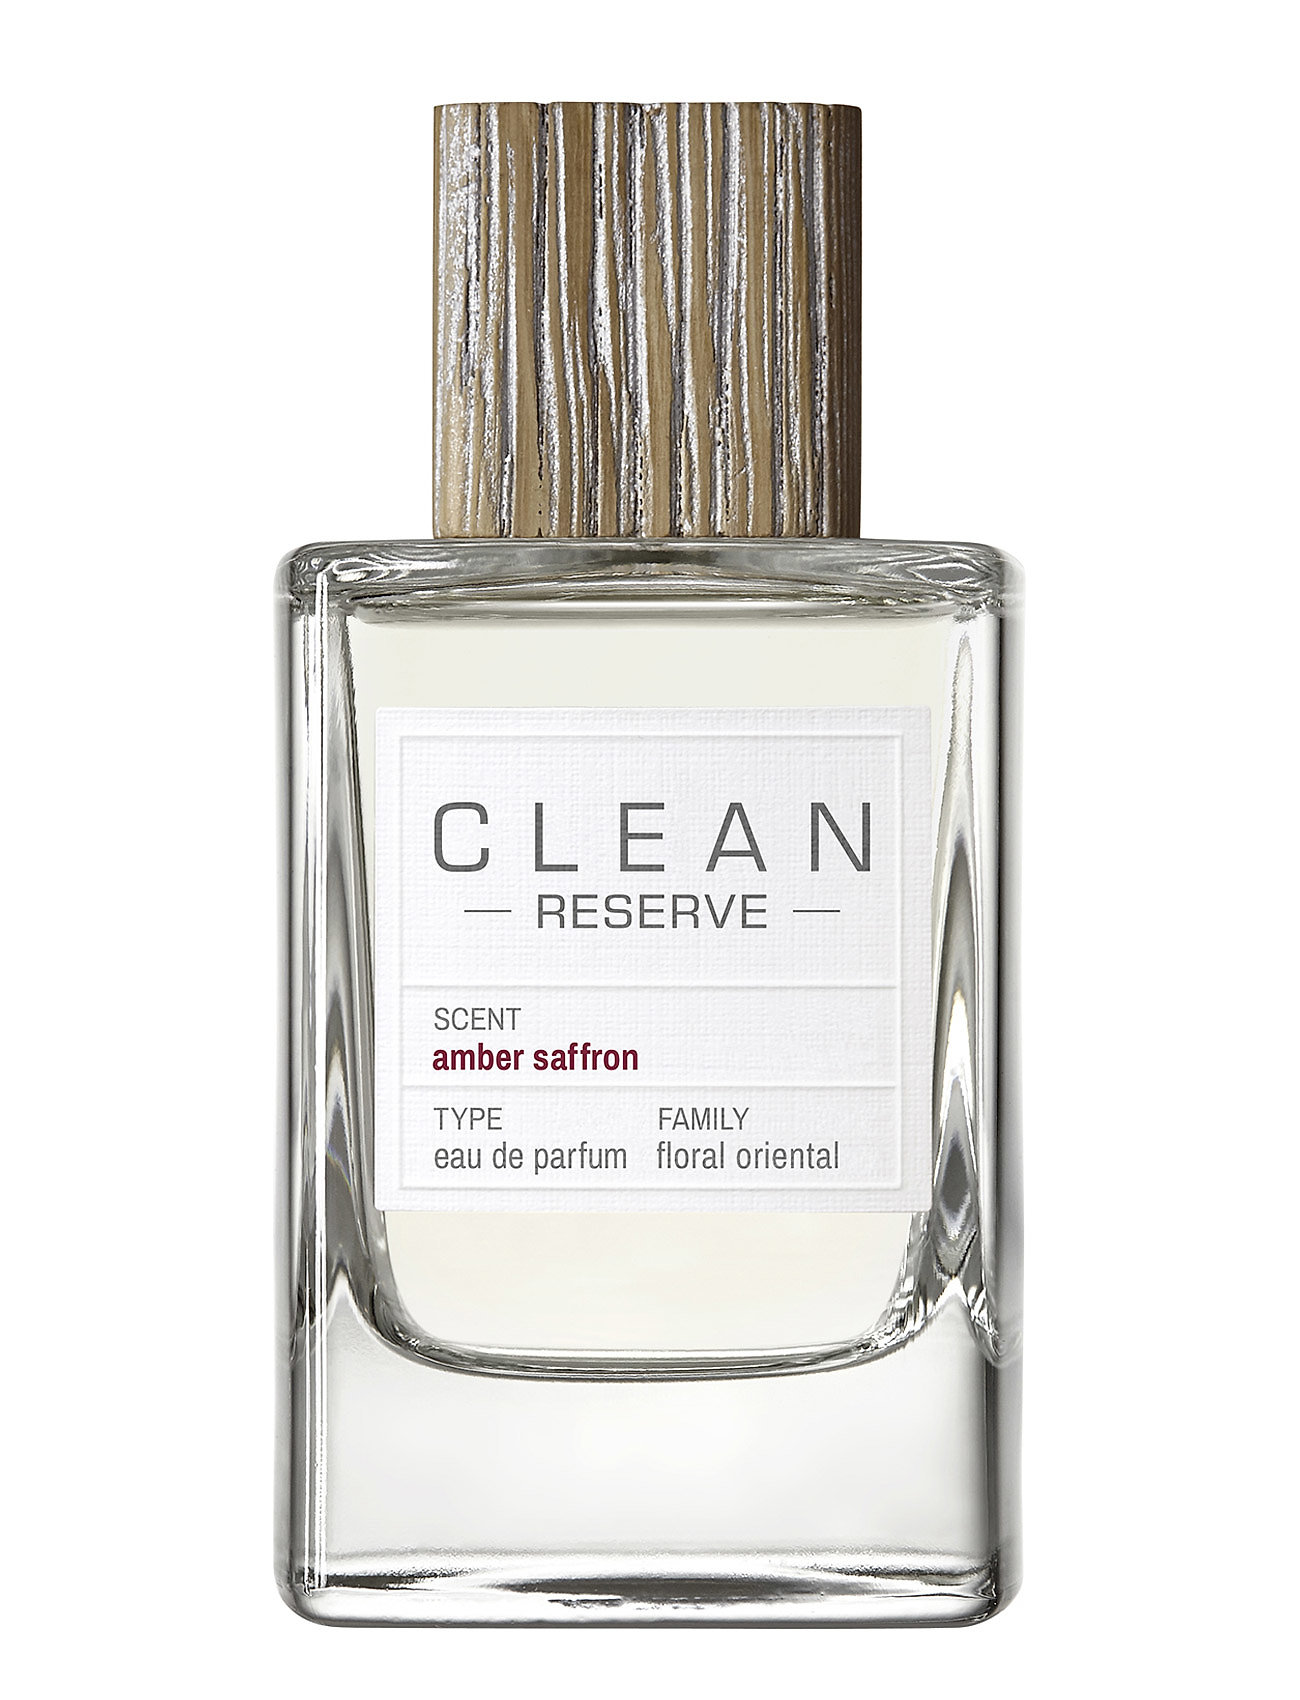 clean reserve – Clean reserve amber saffron fra boozt.com dk